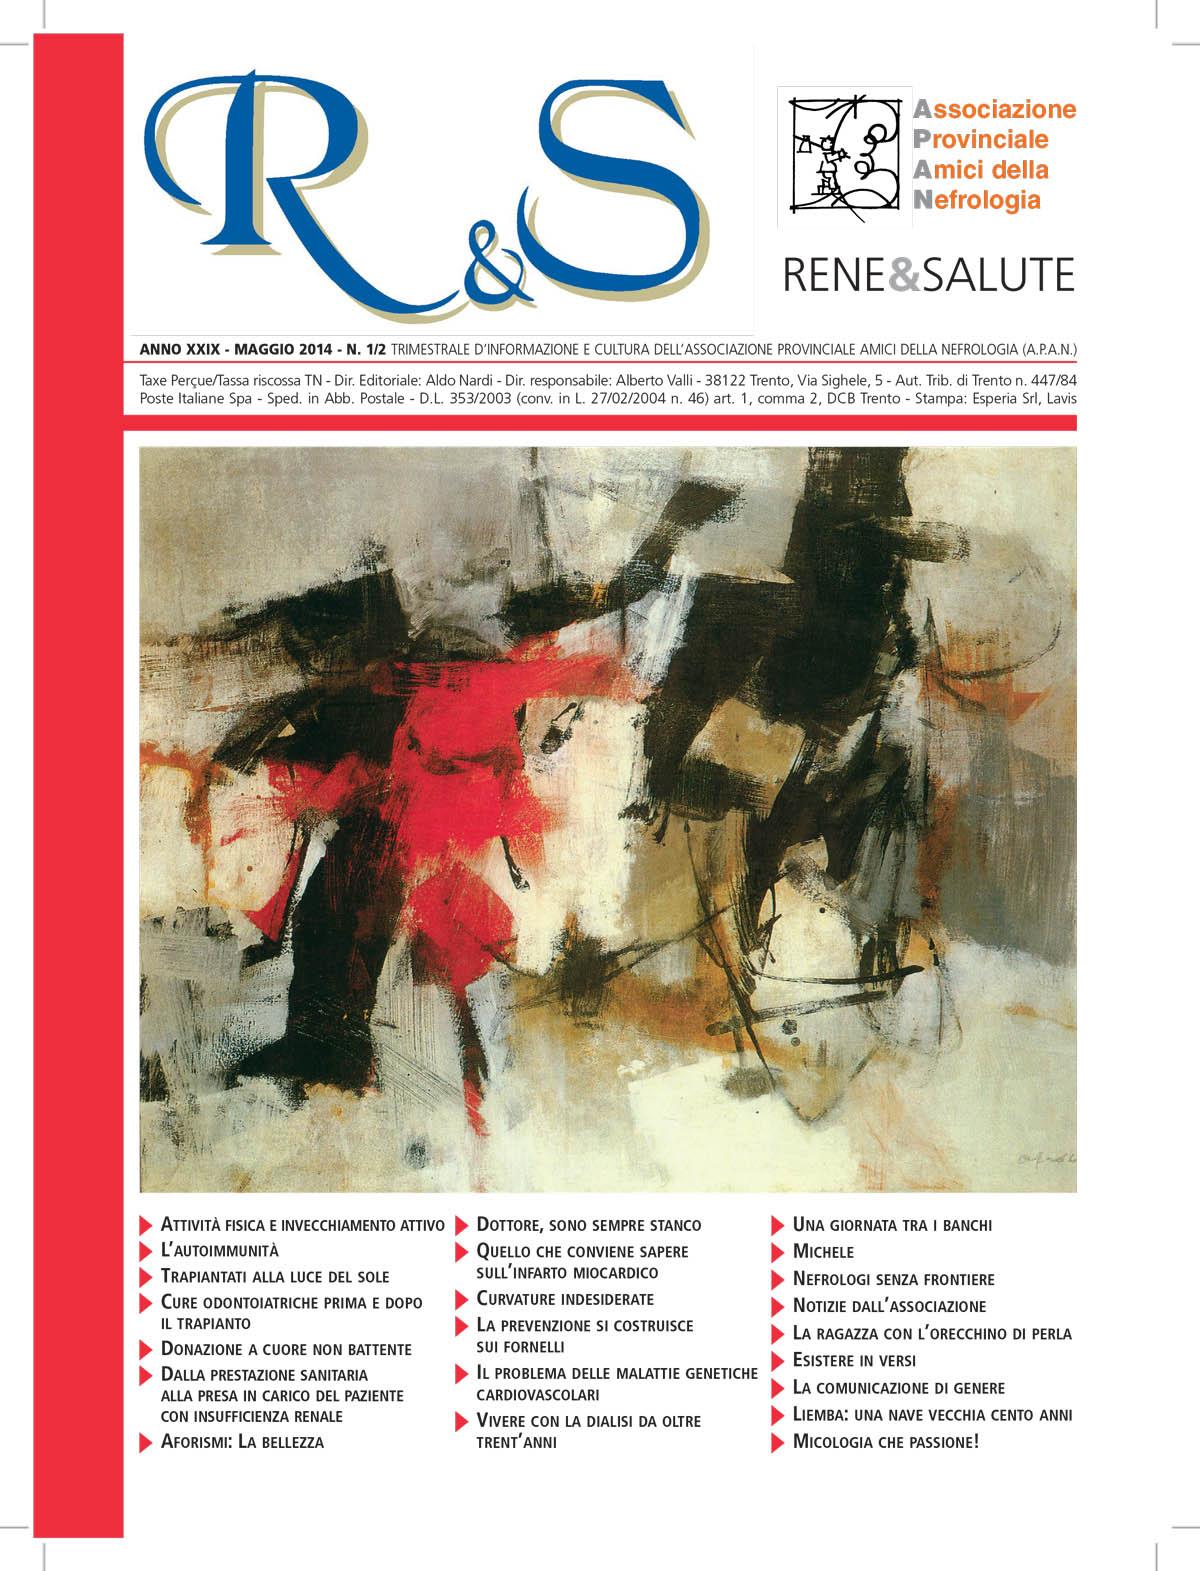 Rene & Salute 2014.1-2